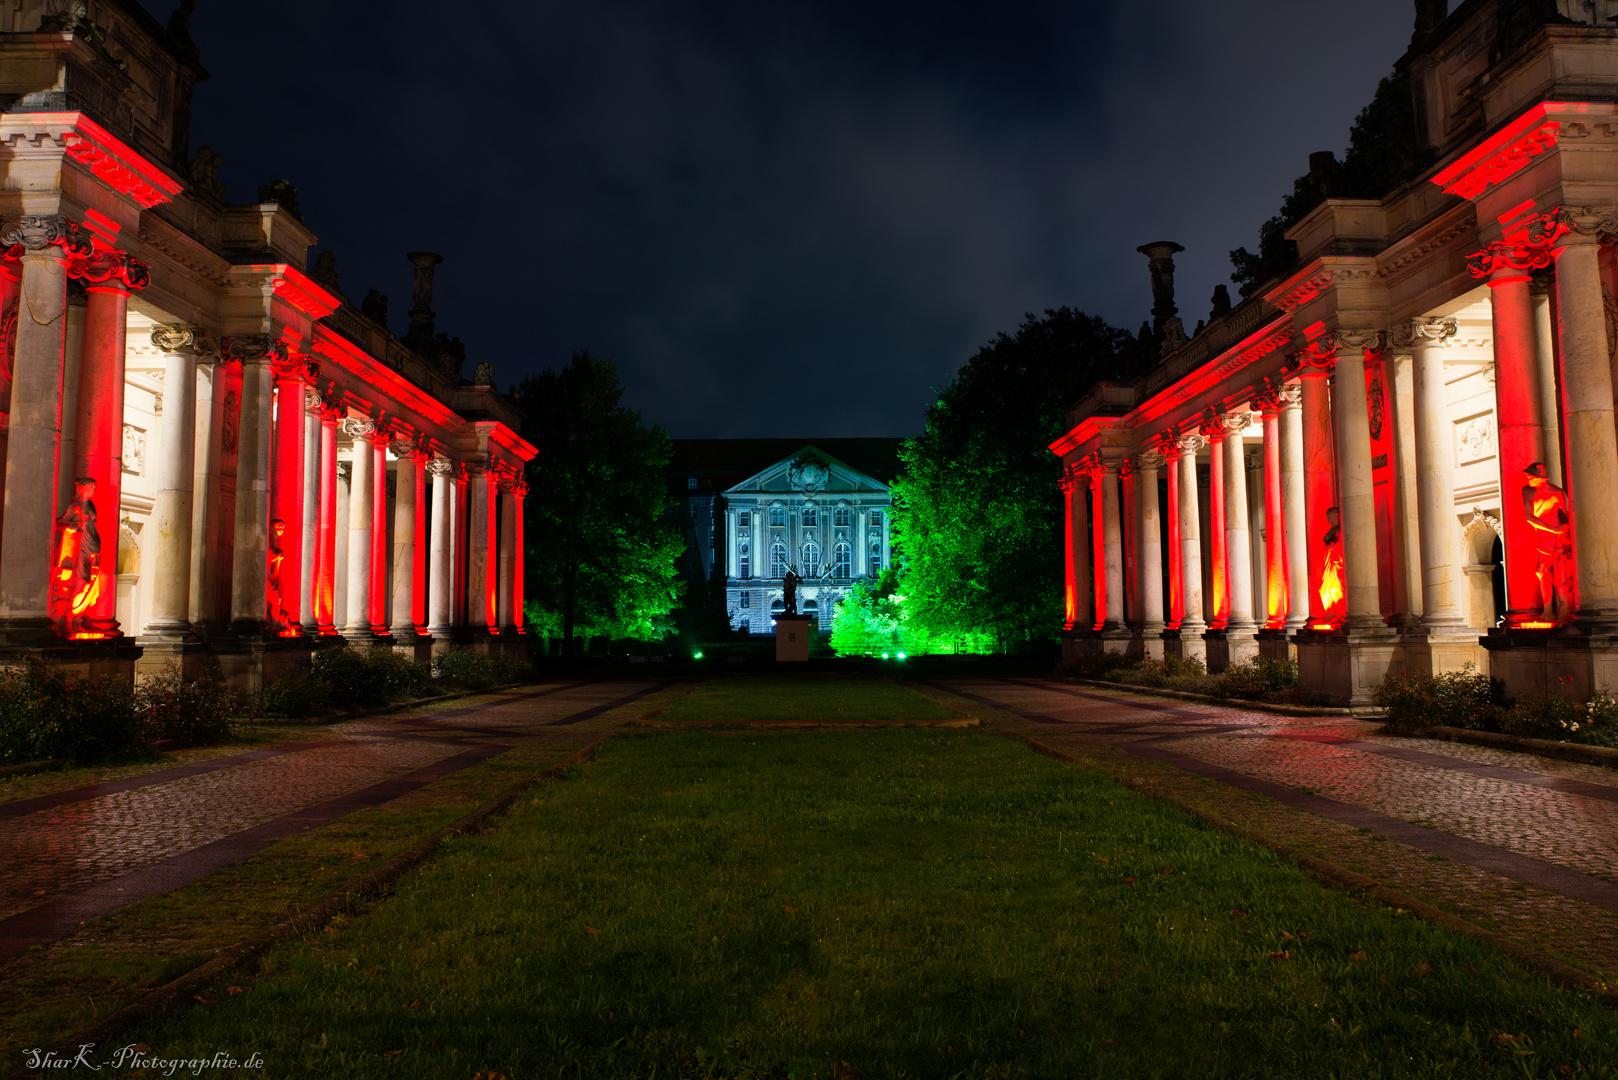 Festival of Lights 2013 - Kammergericht